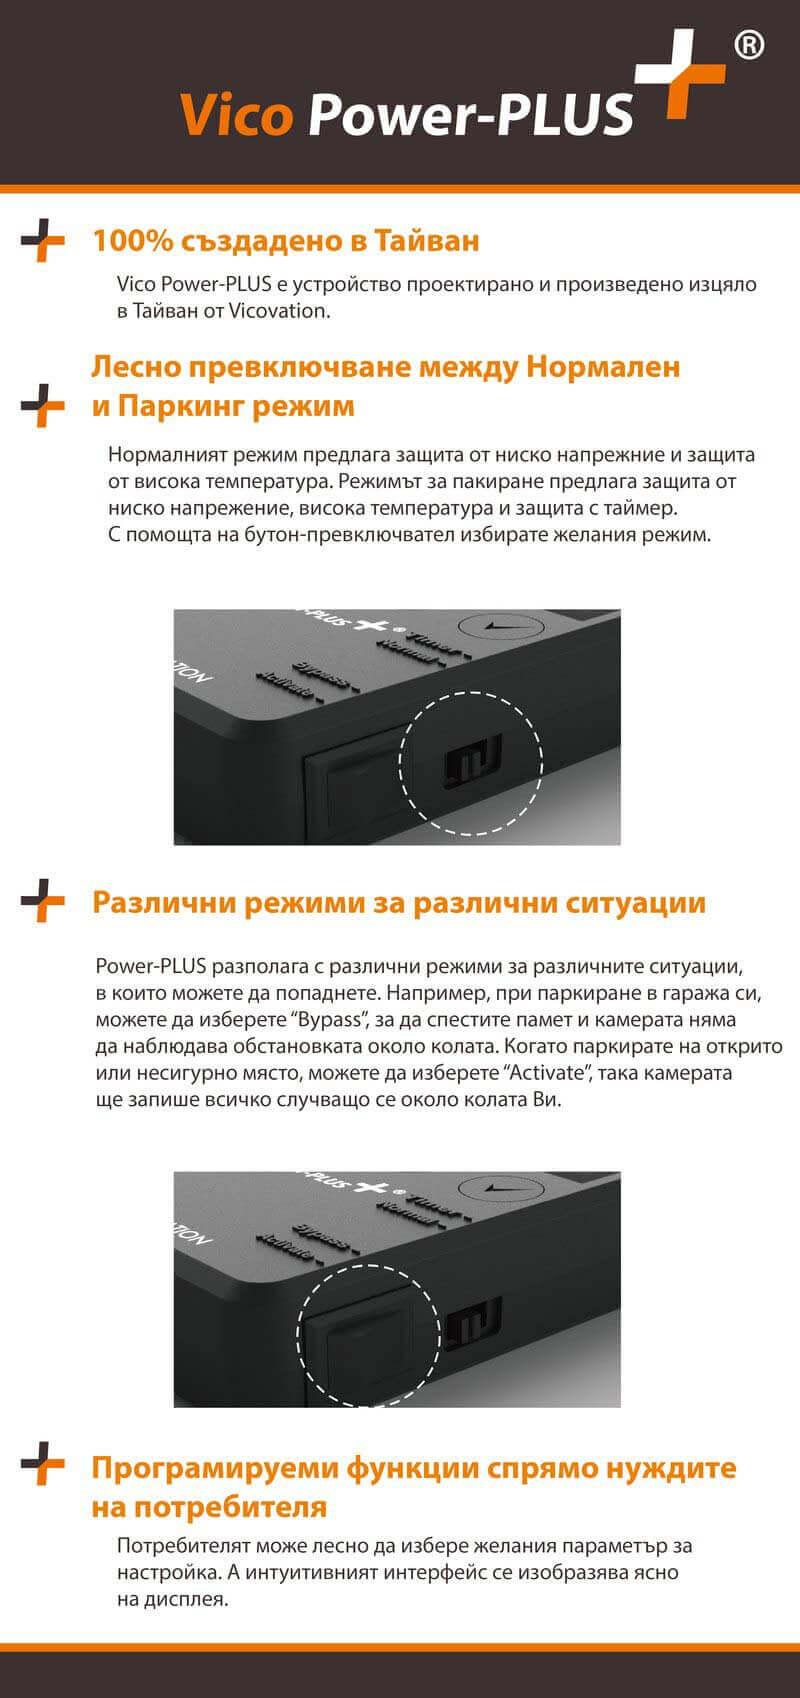 vico-power-plus-specifikacii3